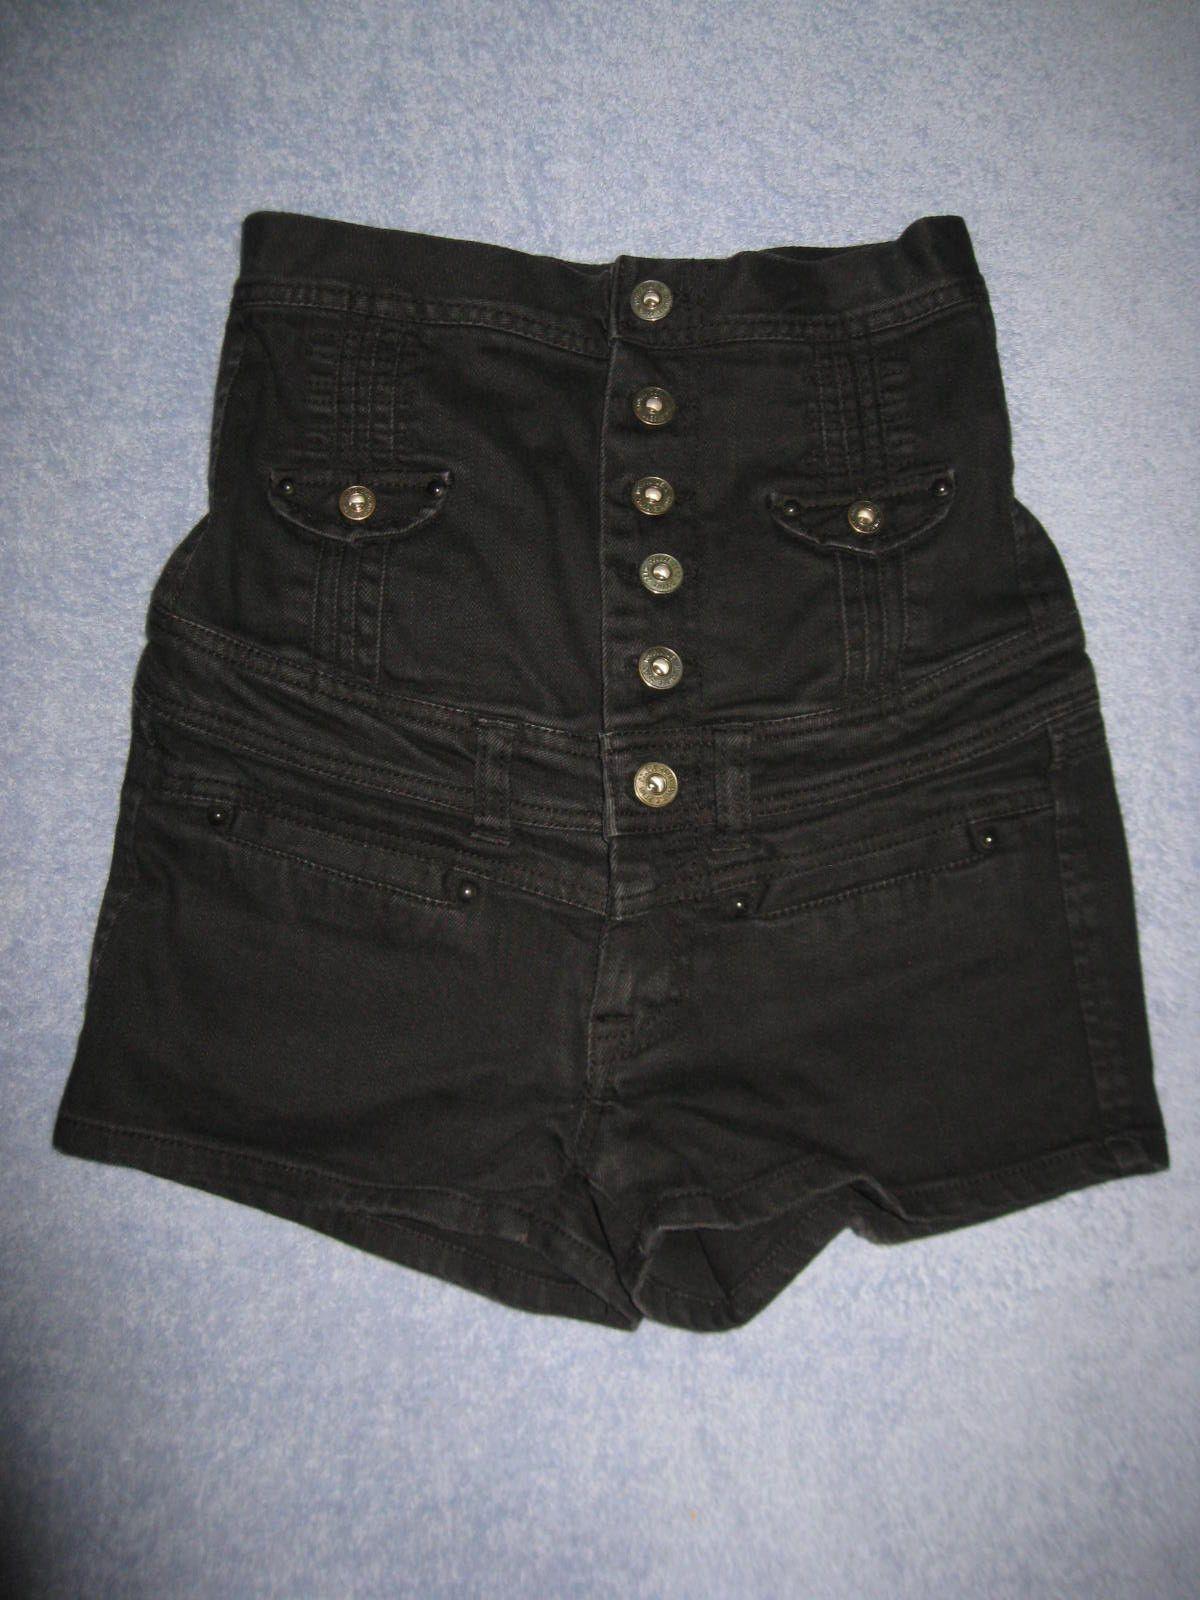 Double Zero Super High Waisted Denim Short Shorts S | Short shorts ...